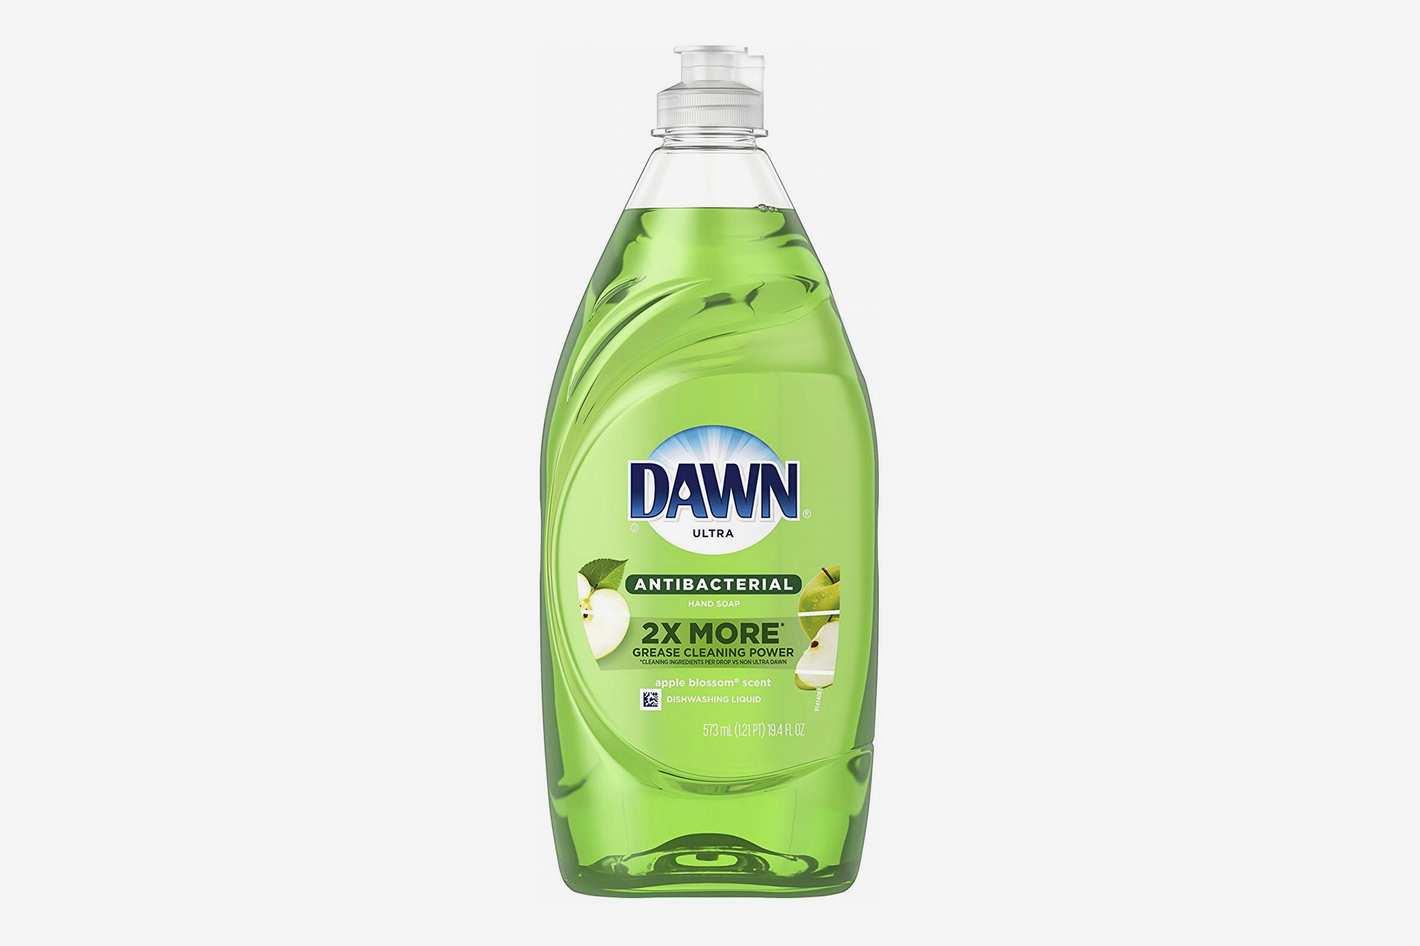 Dawn Ultra Antibacterial Dishwashing Liquid